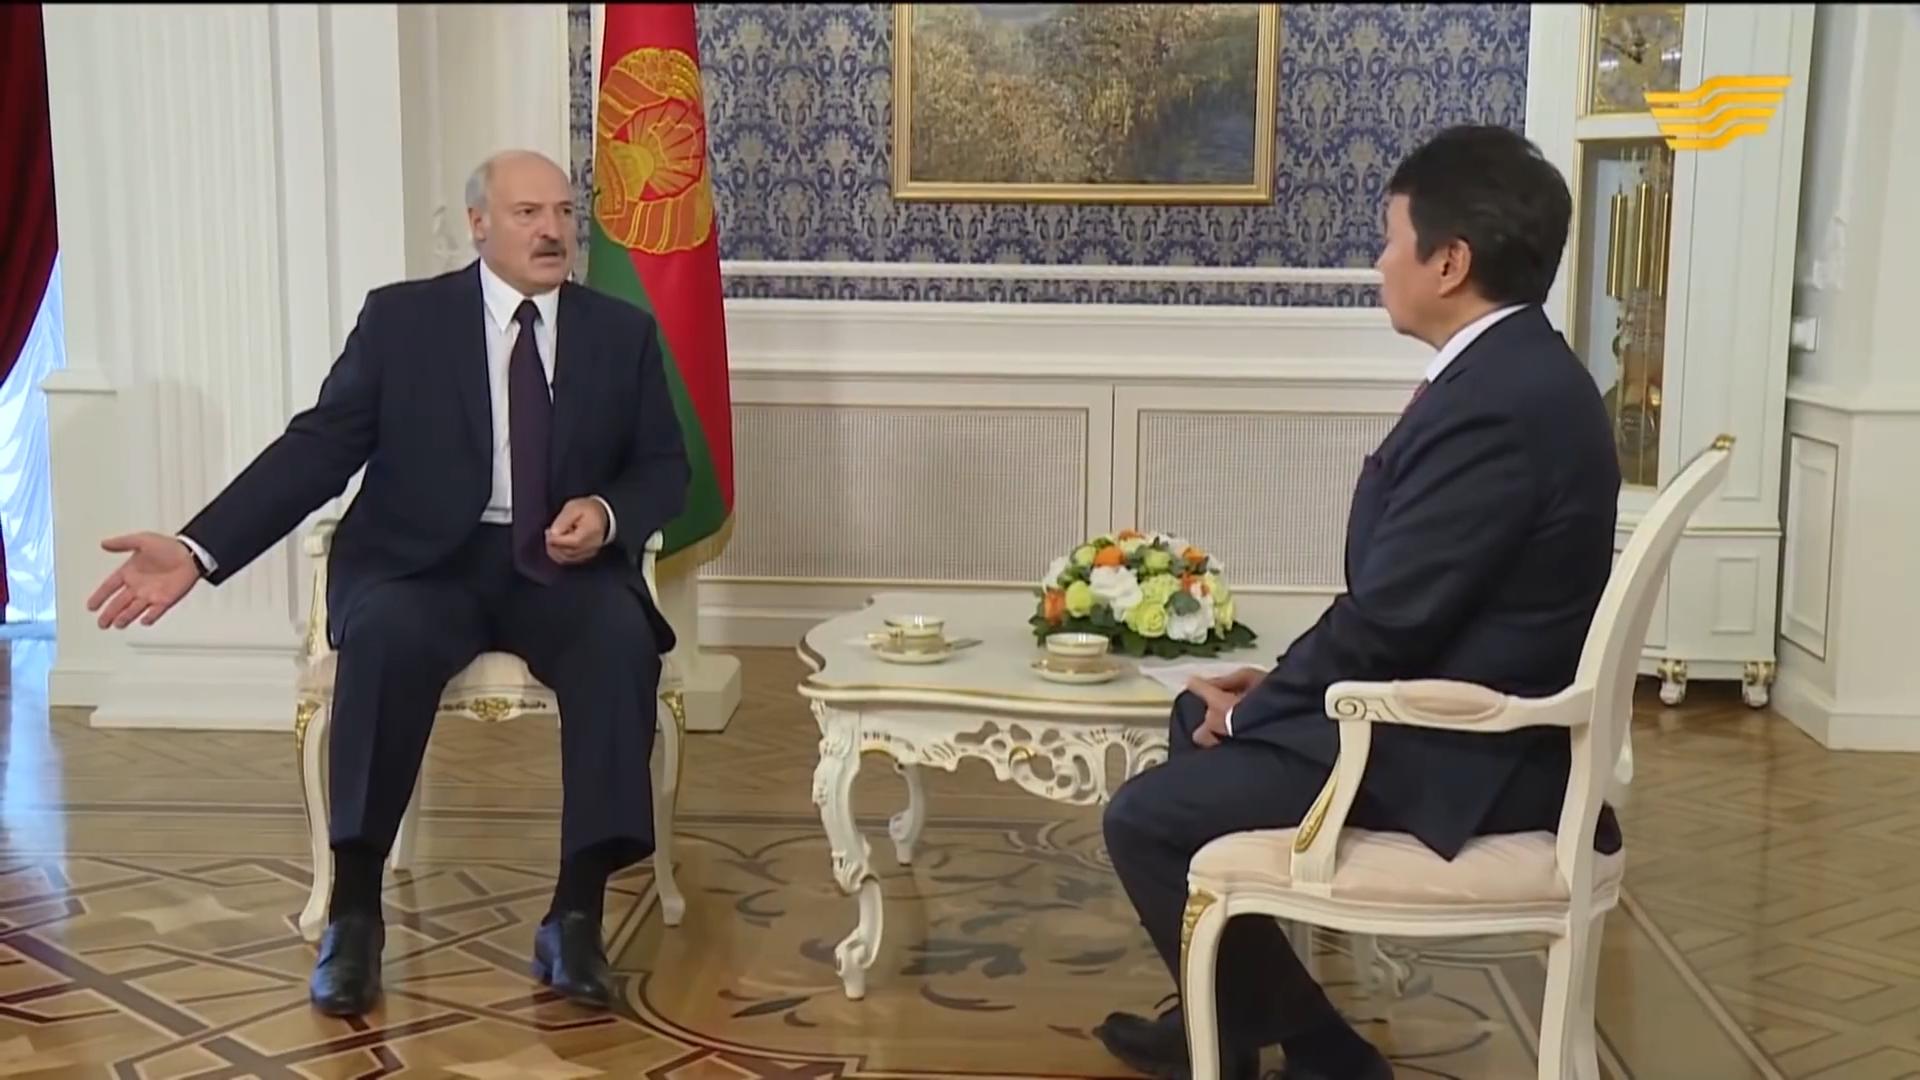 20191022_20-40-Александр Лукашенко дал эксклюзивное интервью телеканалу «Хабар»-scr23